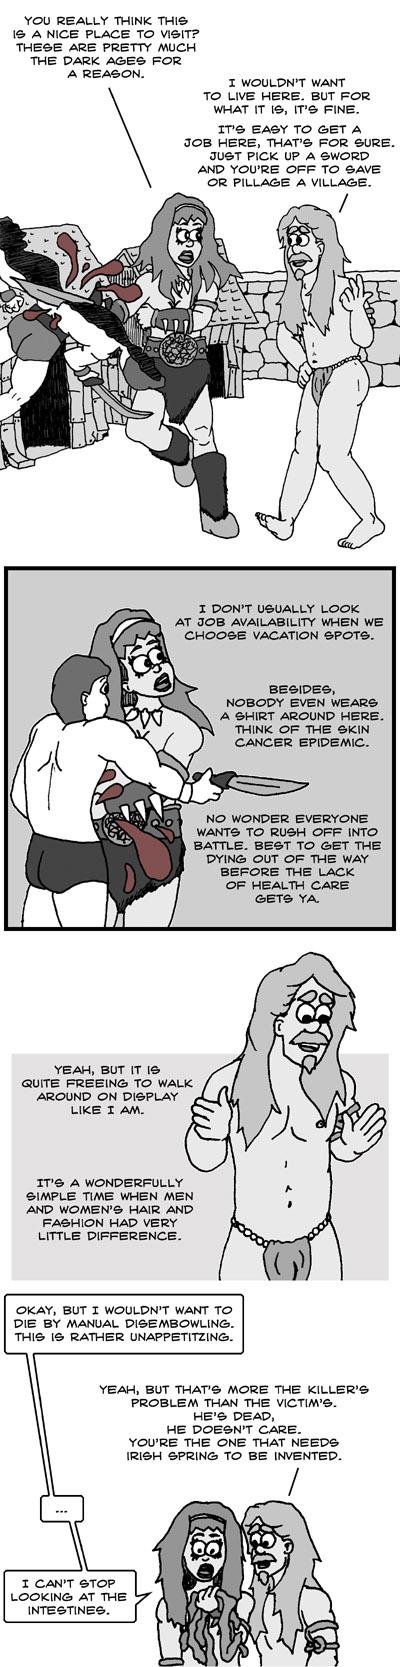 Conan - It takes guts to disembowel barehanded